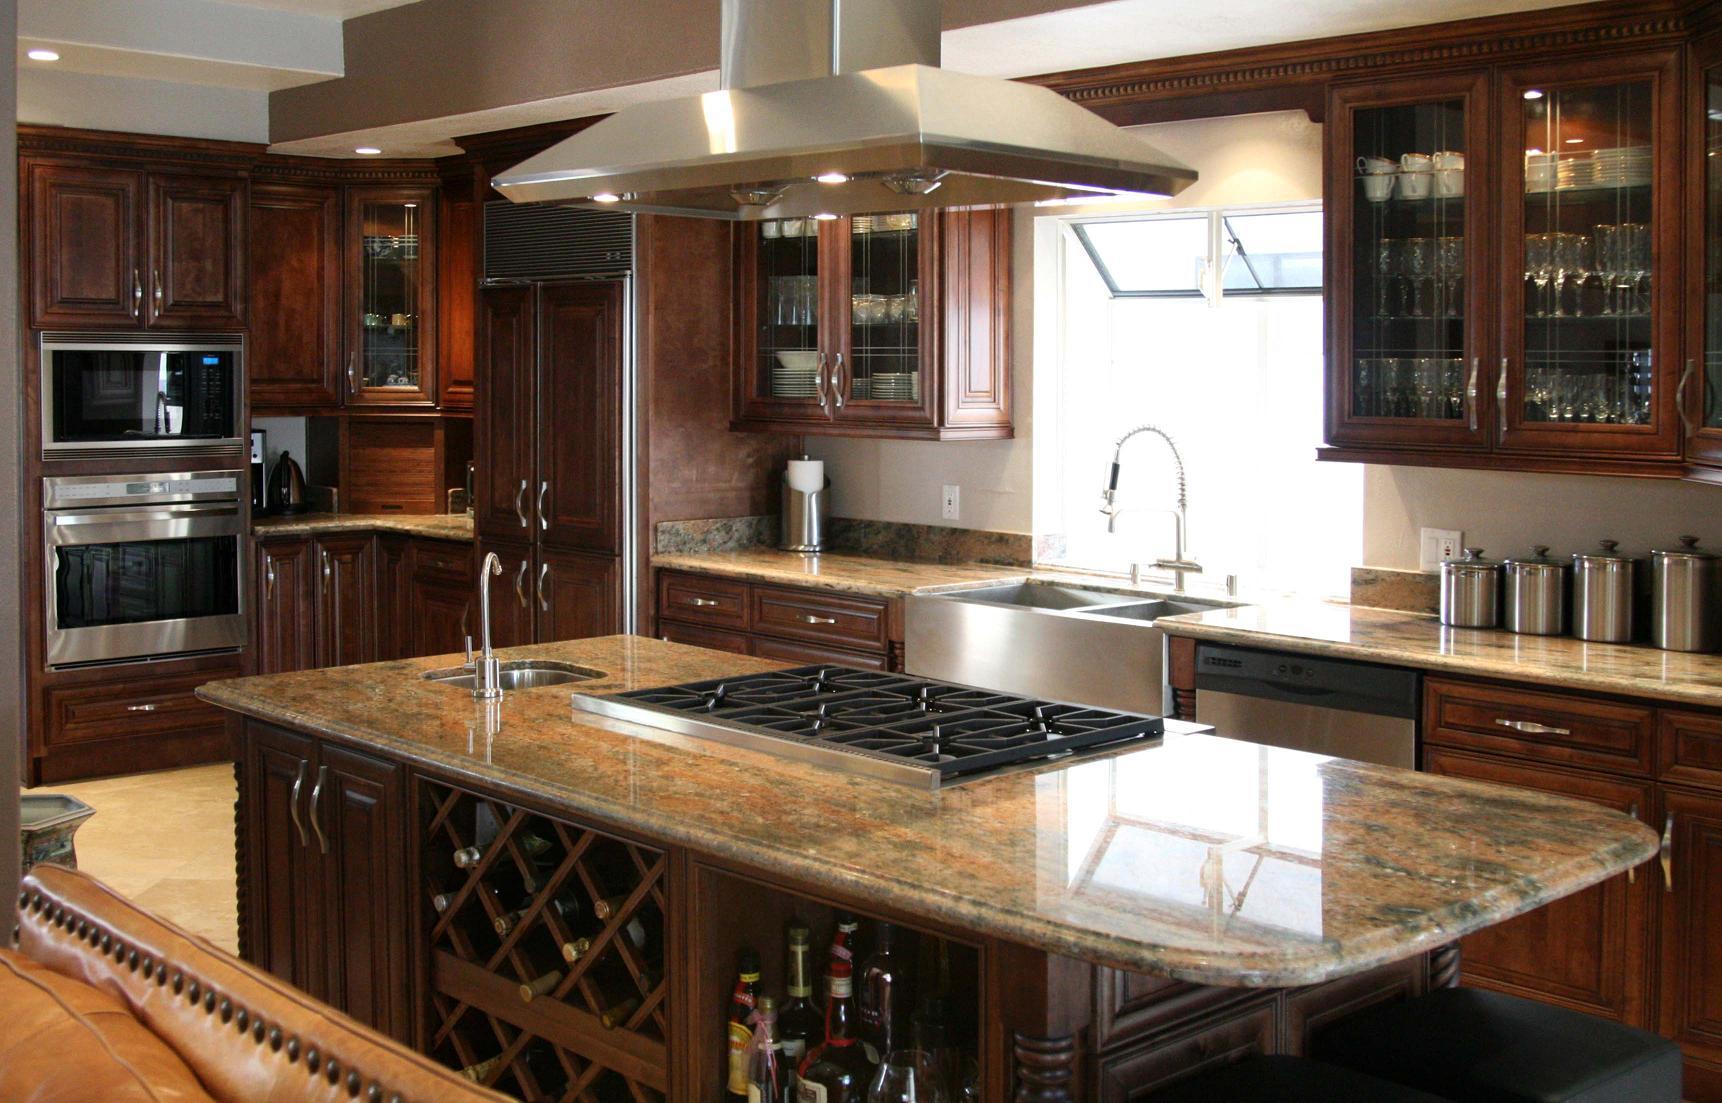 ... Stainless Steel Kitchen Cabinet Knobs Photo   3 ...